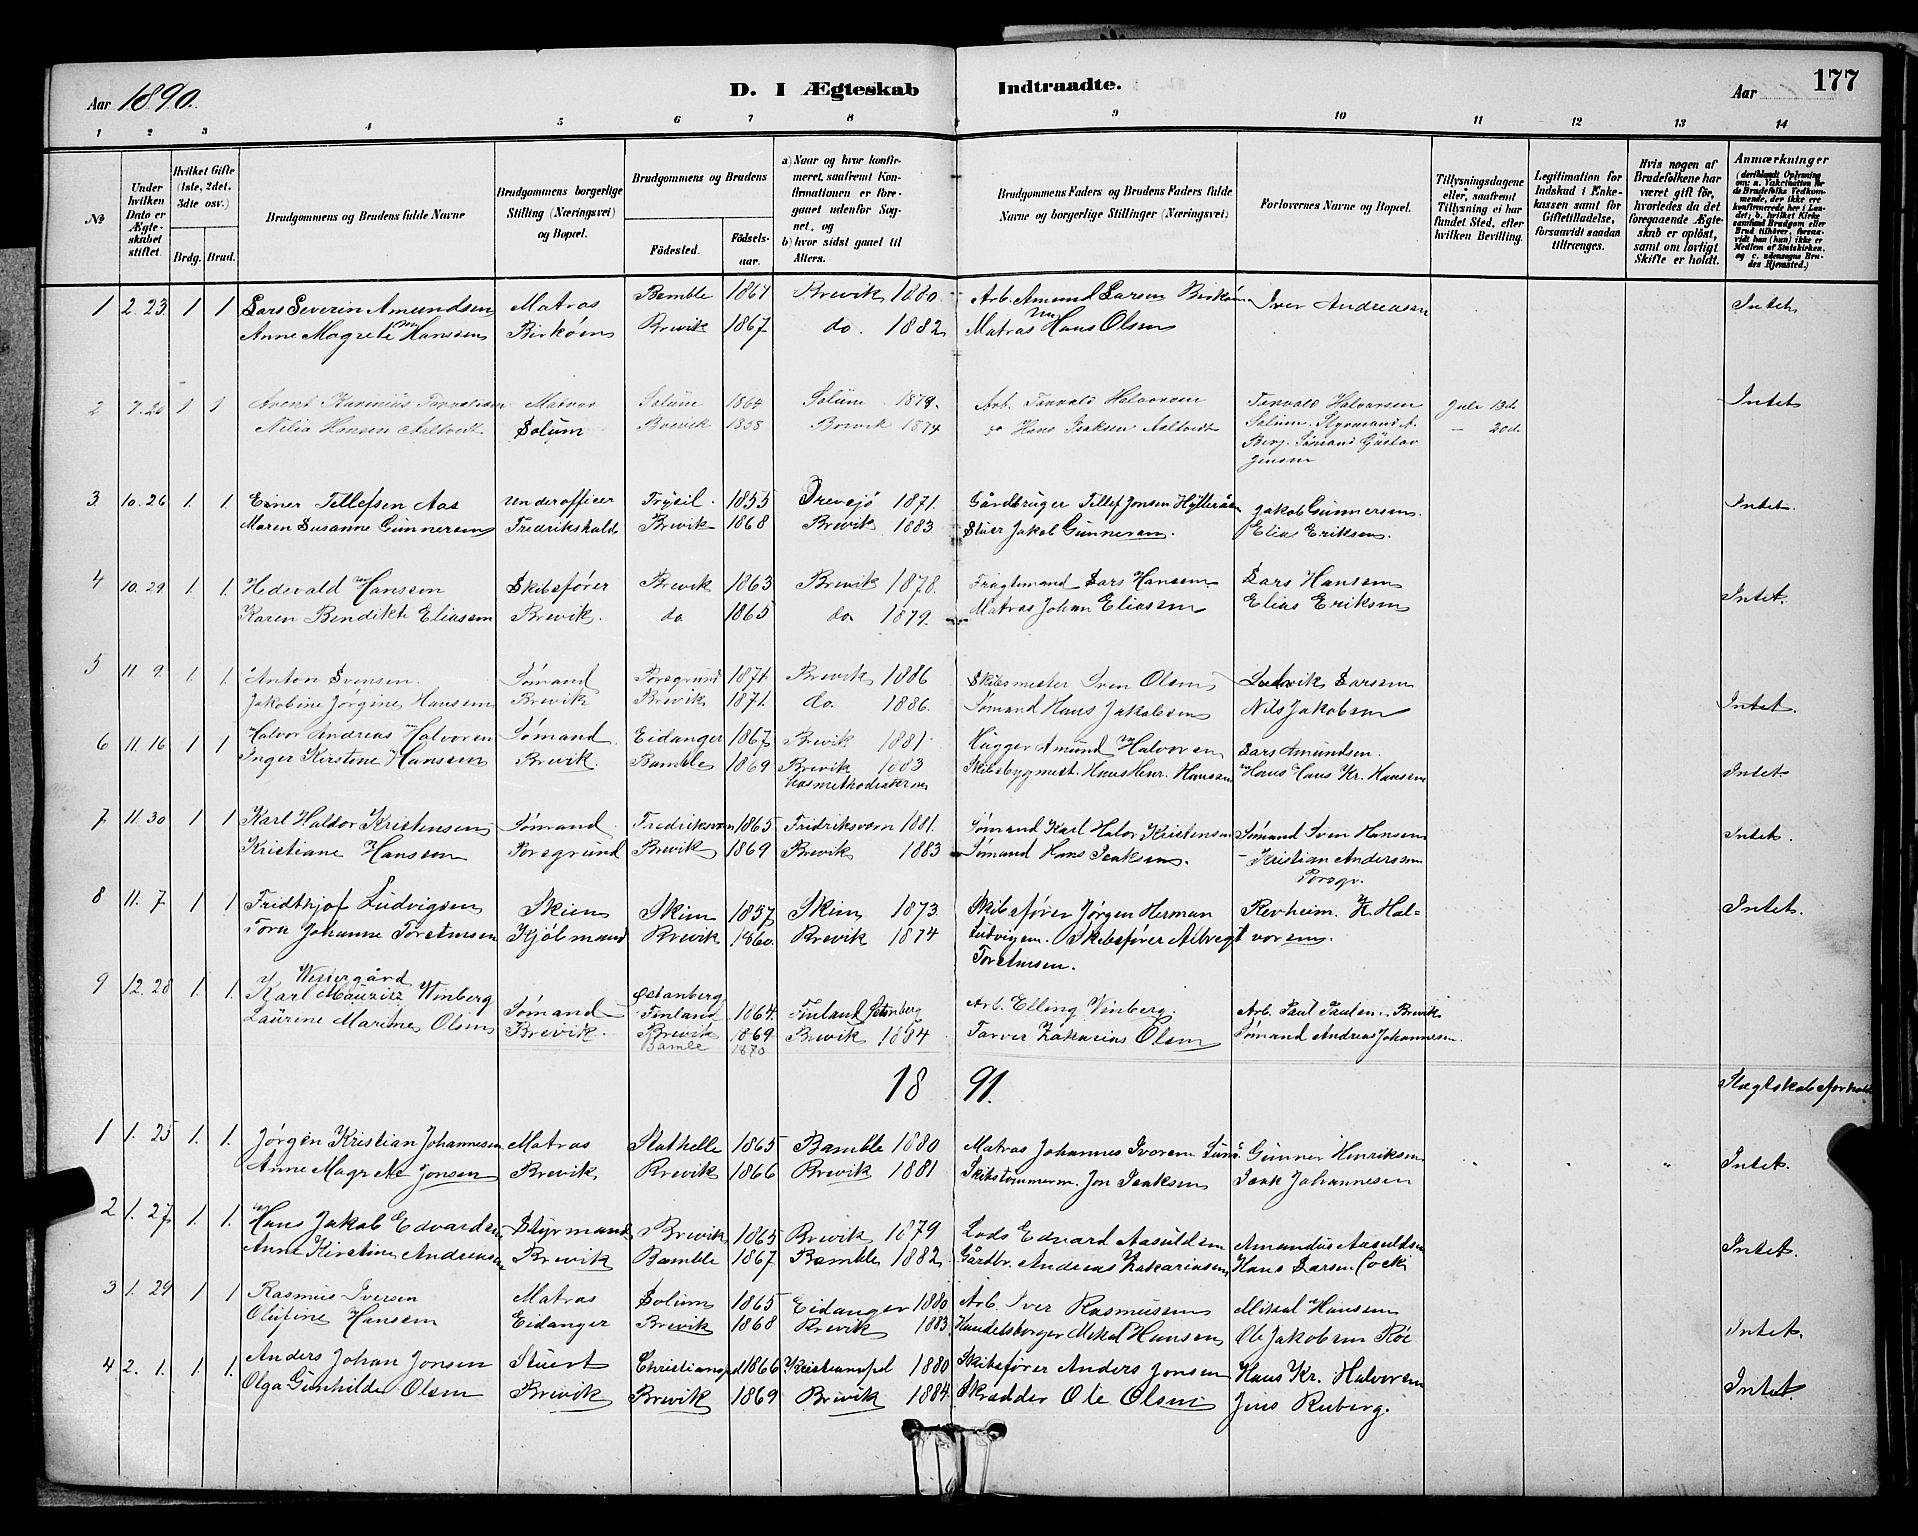 SAKO, Brevik kirkebøker, G/Ga/L0004: Klokkerbok nr. 4, 1882-1900, s. 177